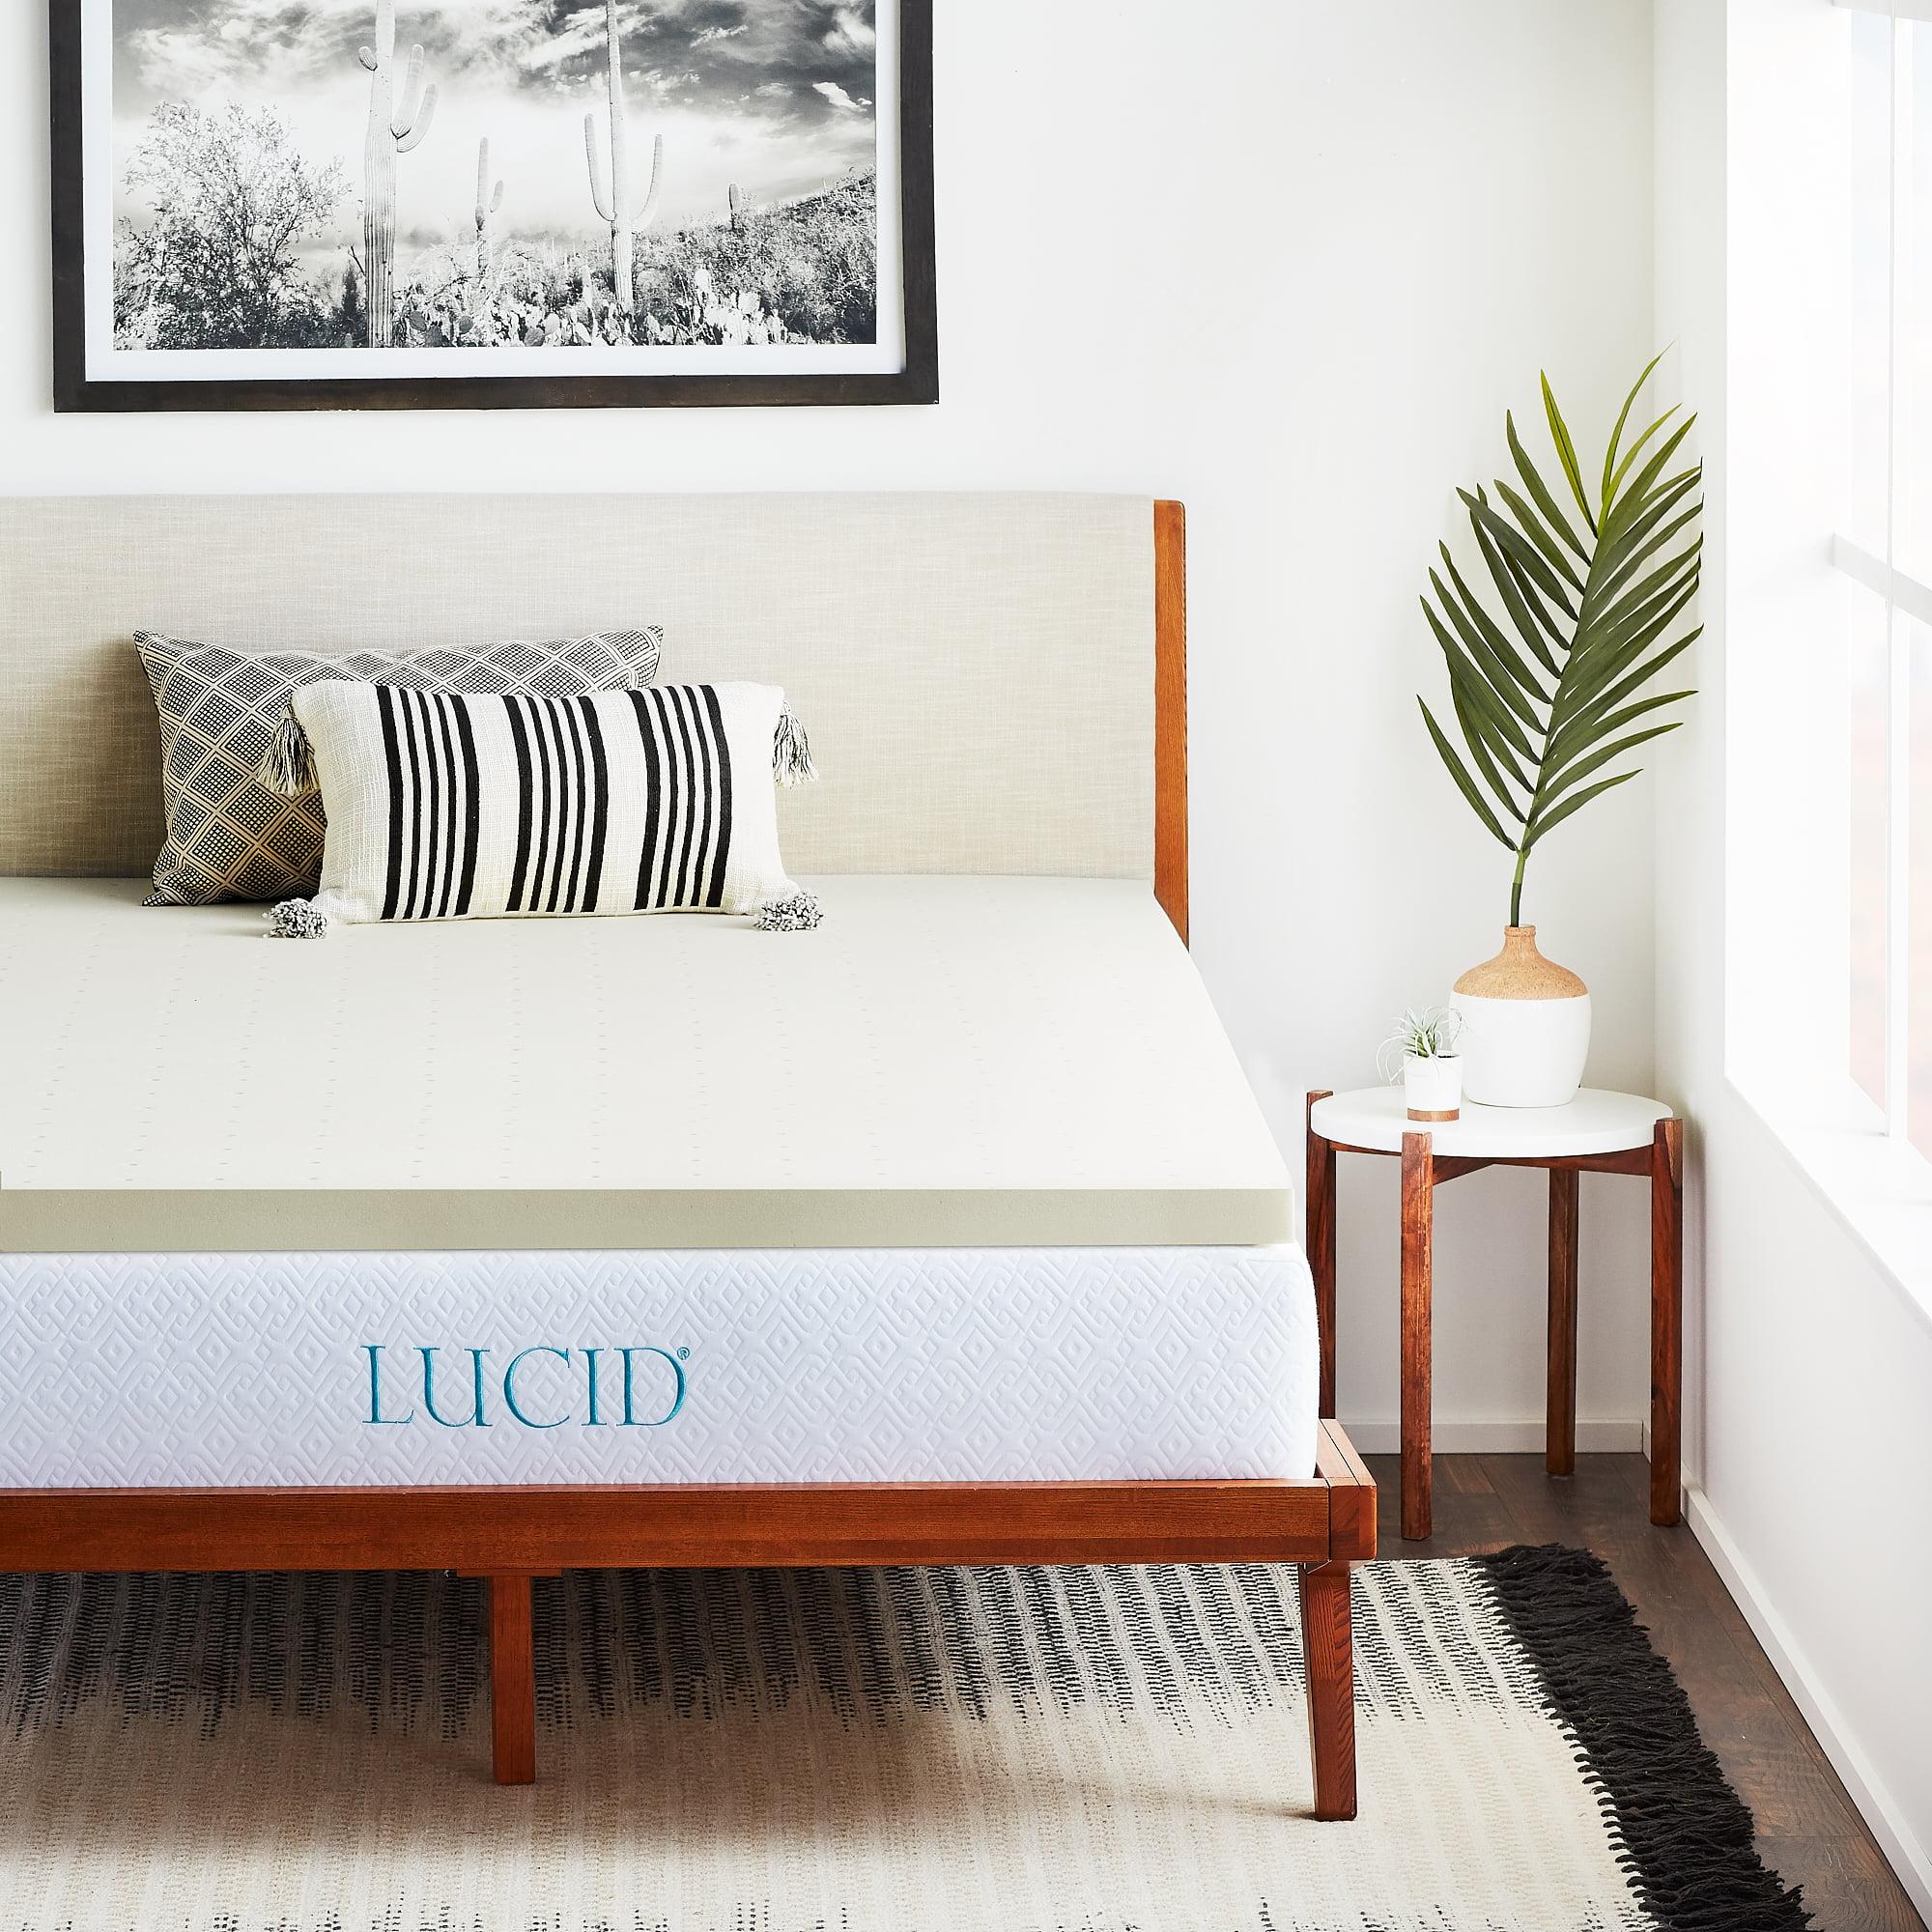 lucid 2 ventilated plush memory foam mattress topper multiple sizes